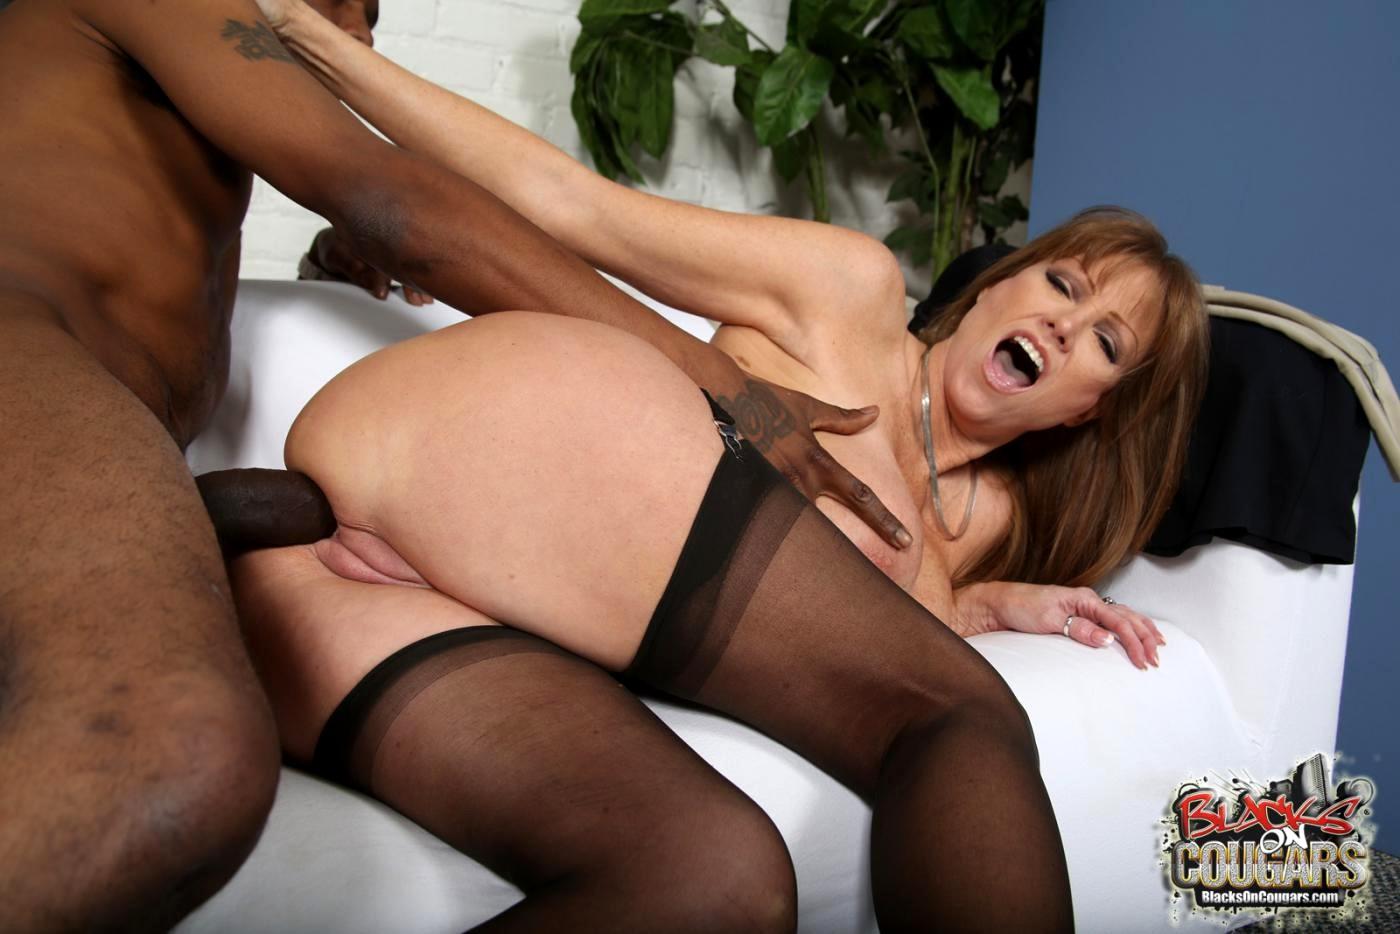 Fucking fucking black moms anal pornhub boob girl only